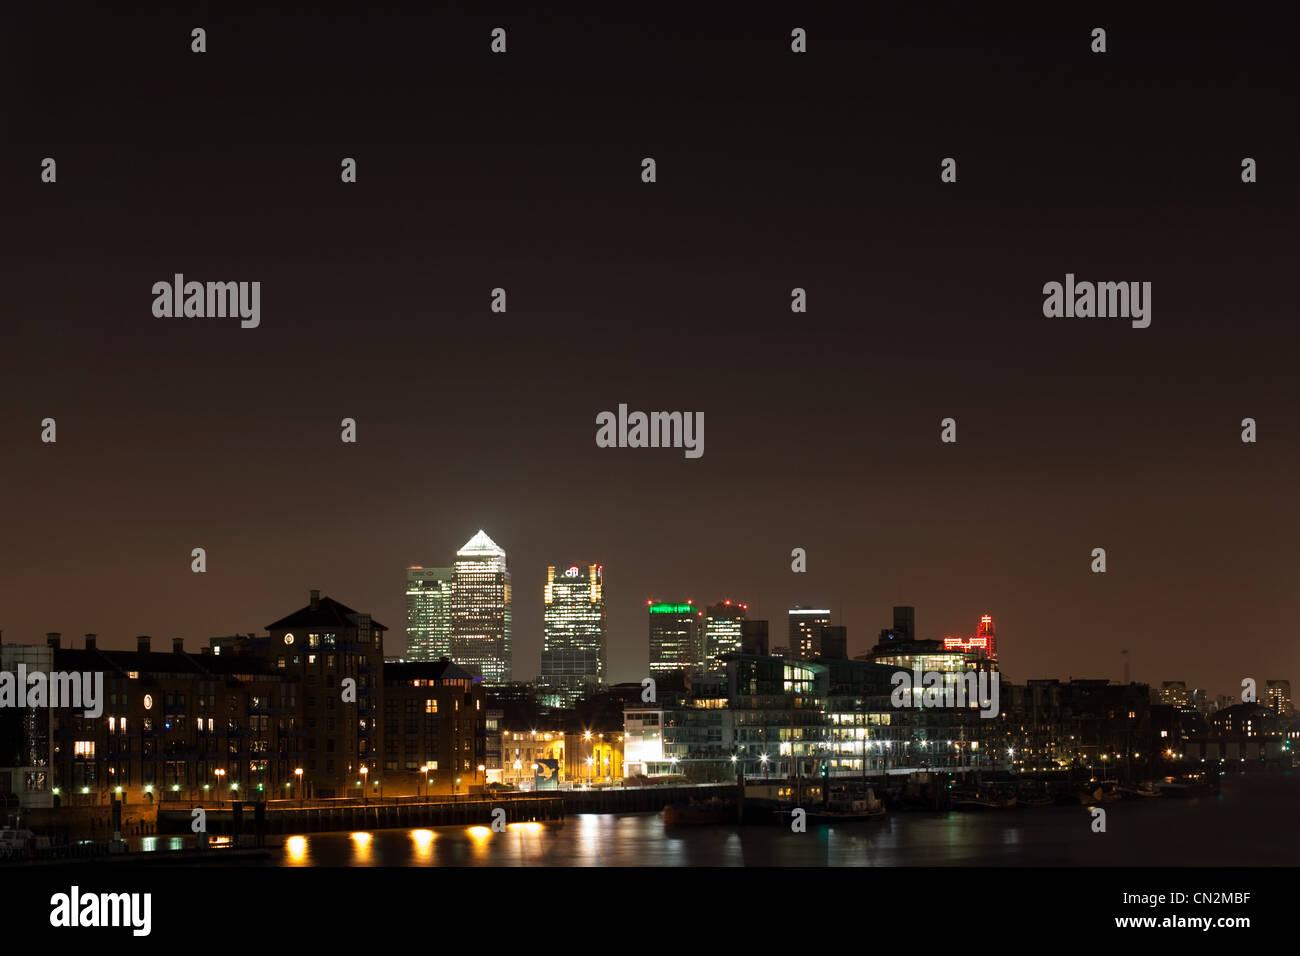 Blick über die Themse in Richtung Canary Wharf, London, UK Stockbild